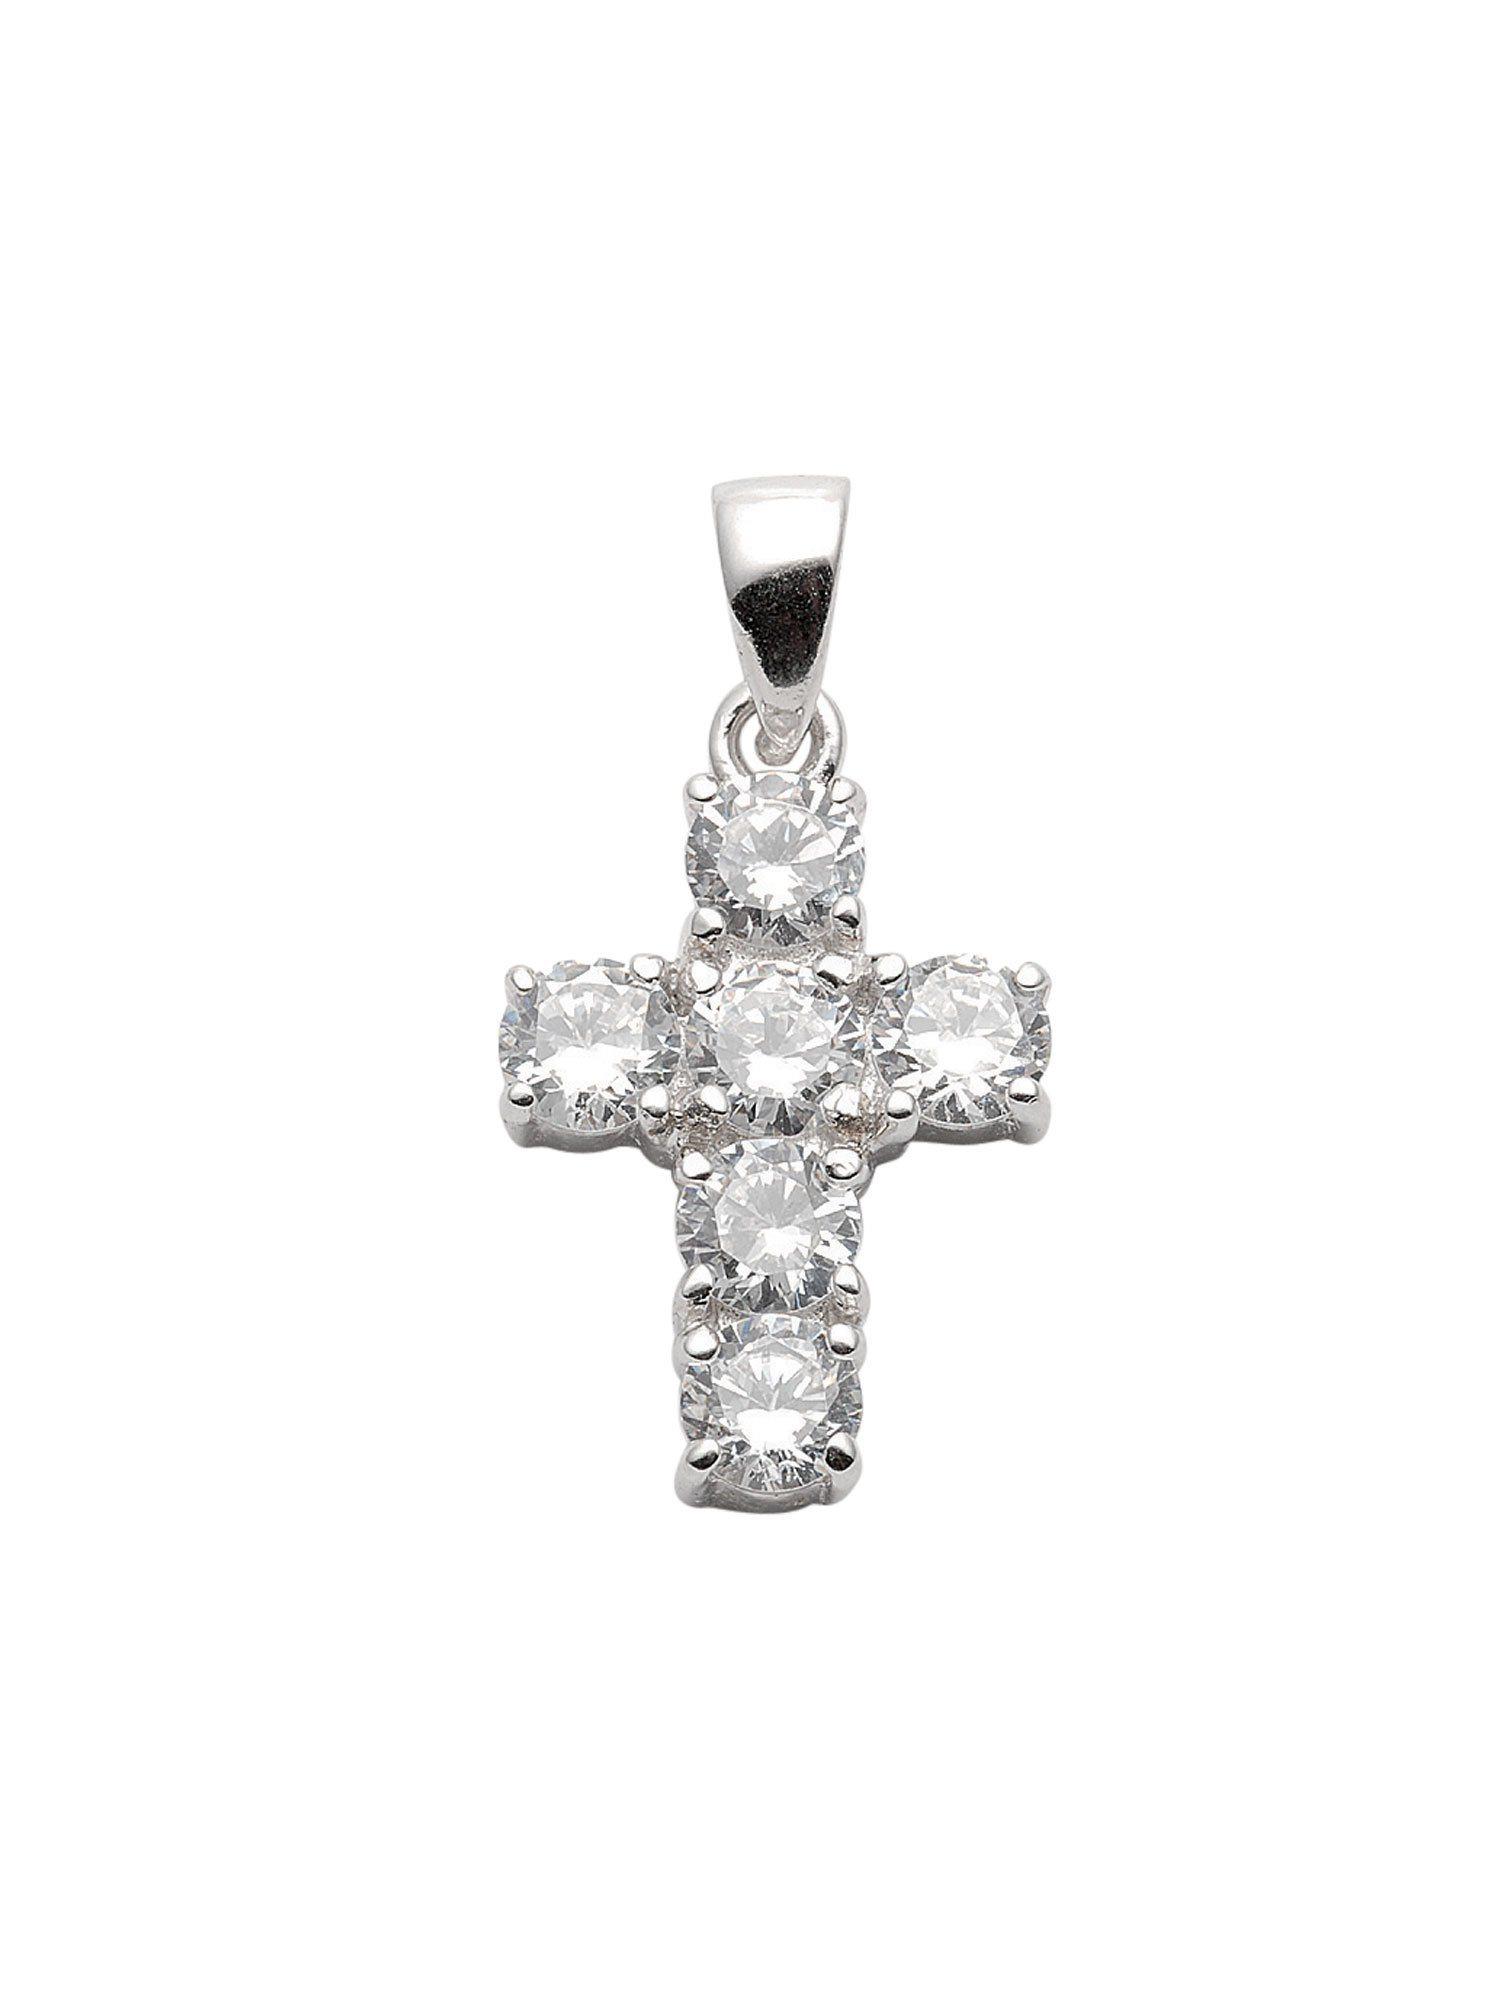 Adelia´s Kettenanhänger »Silber Anhänger« 925 Sterling Silber mit Zirkonia   Schmuck > Halsketten > Ketten ohne Anhänger   Silber   Adelia´s